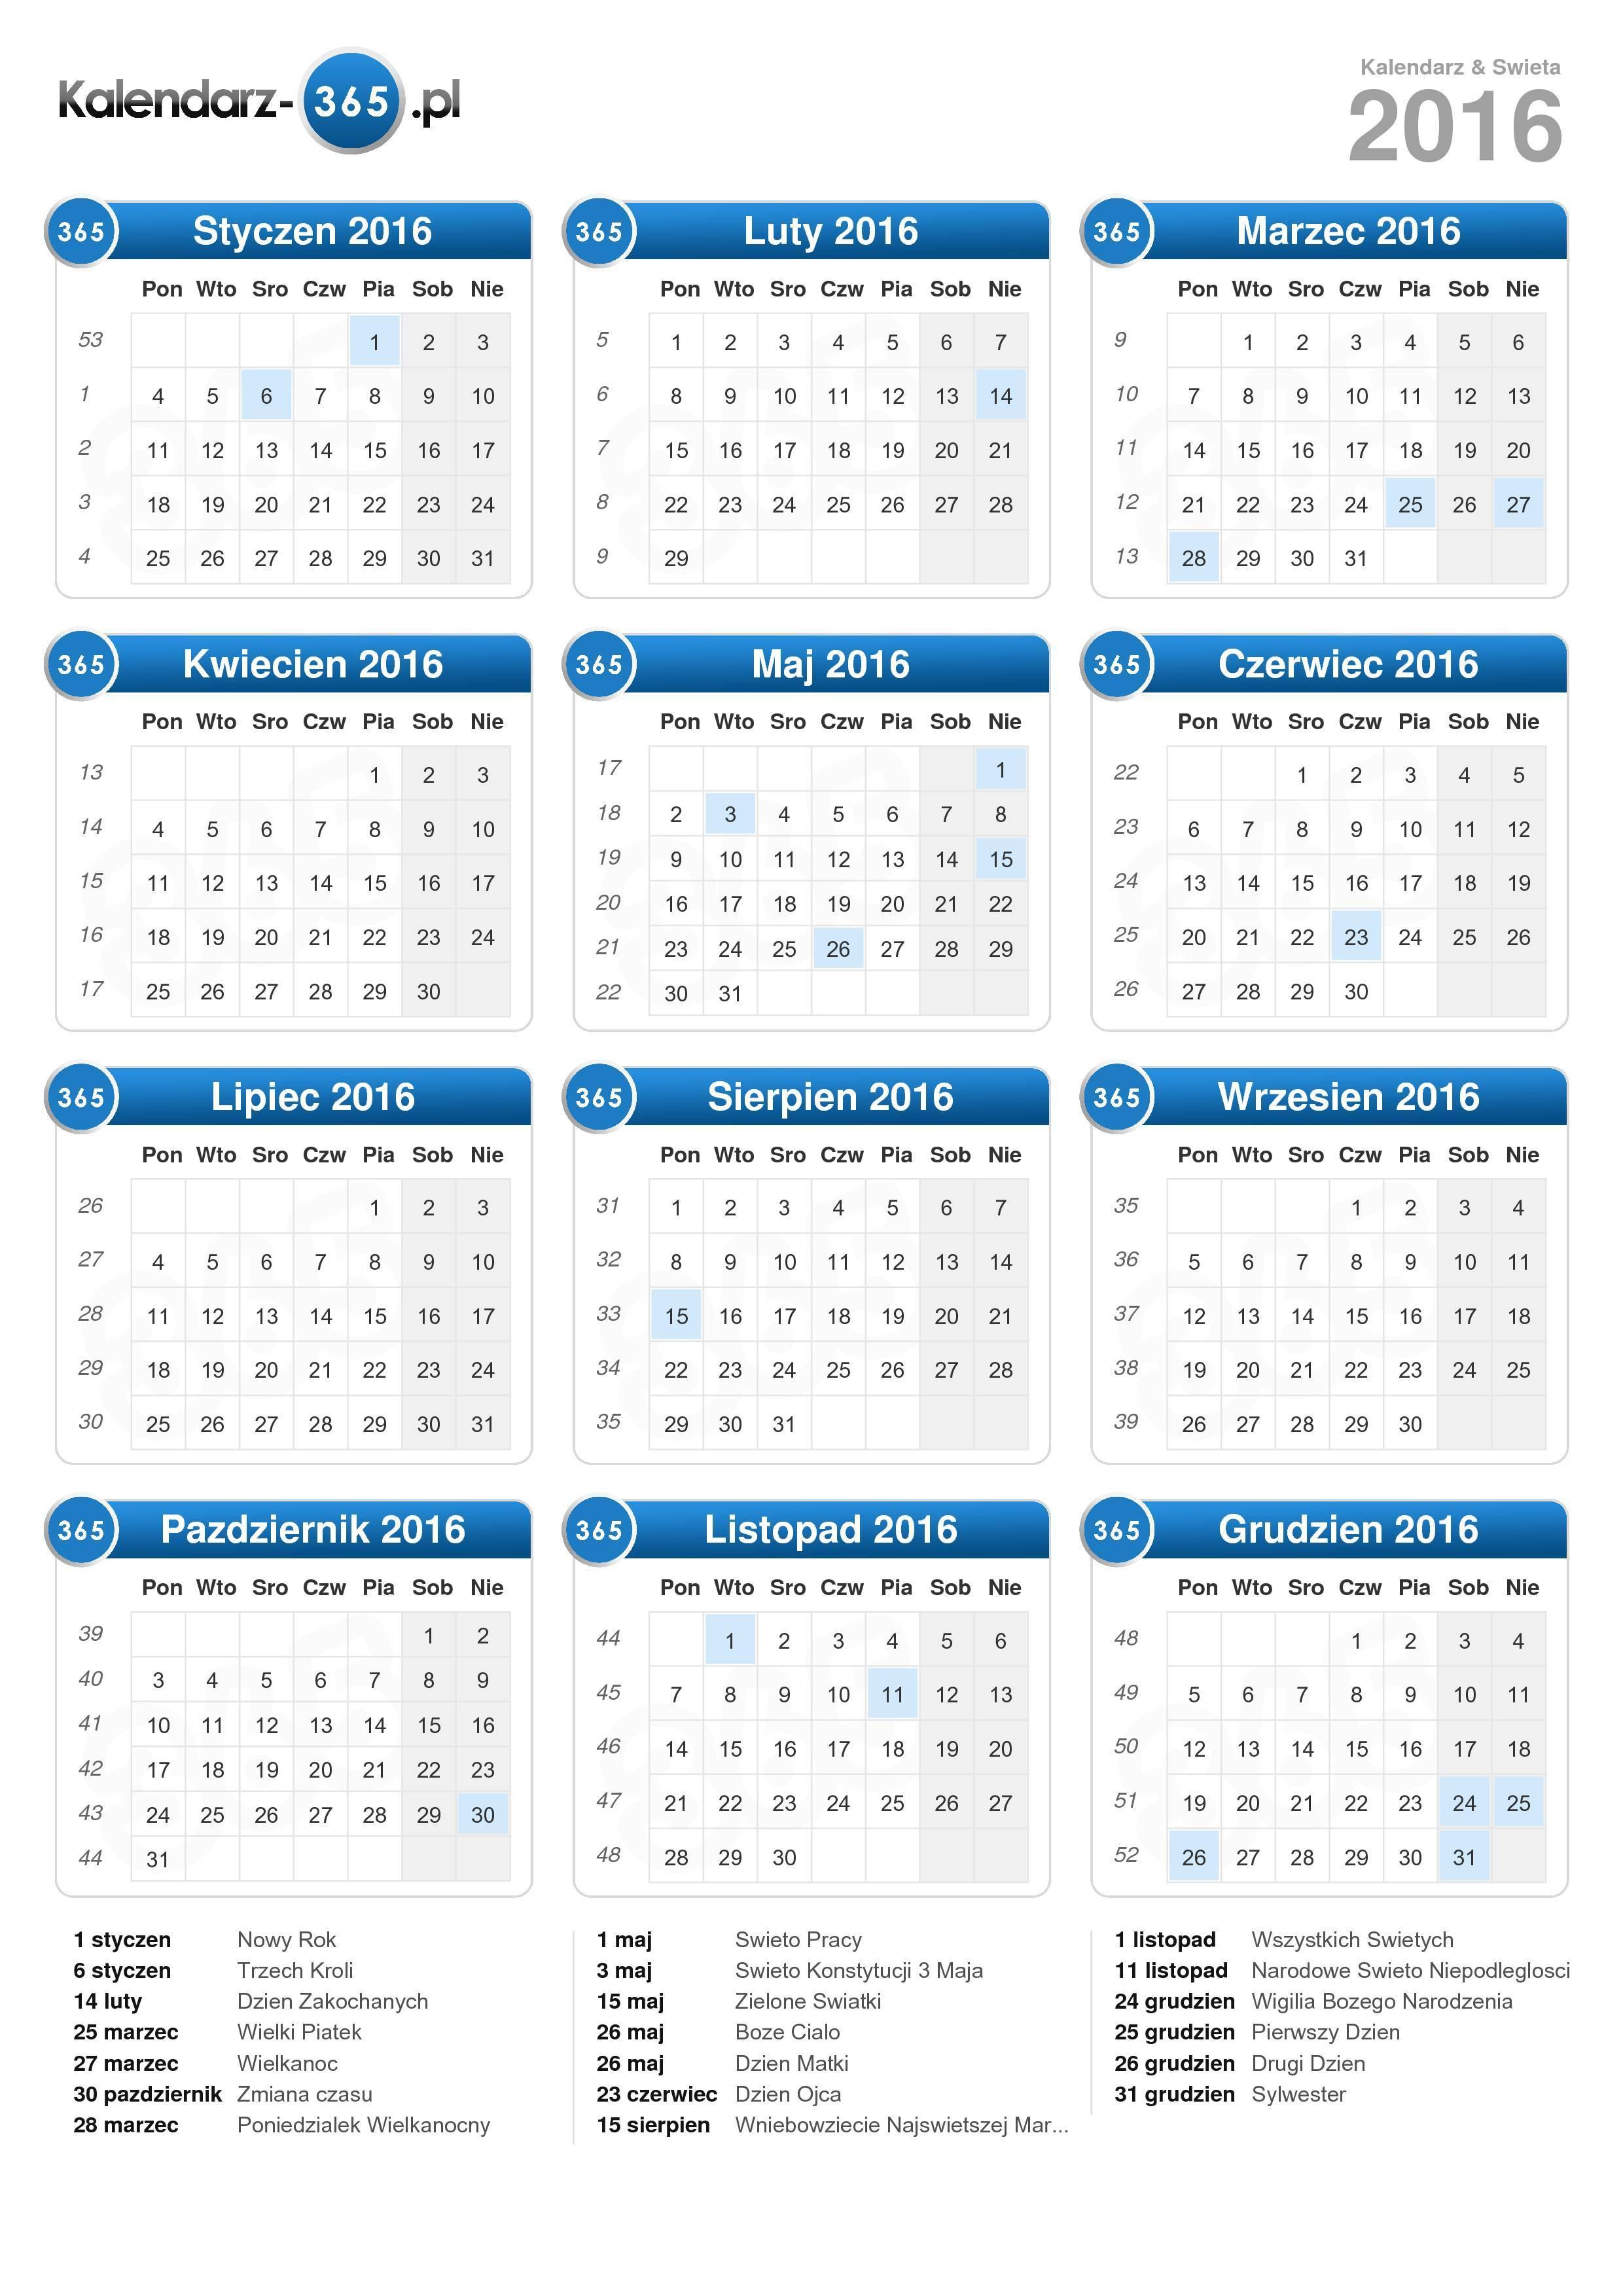 Kalendarz 2016 Exel Calendar Template 2016 Pictures to pin on ...